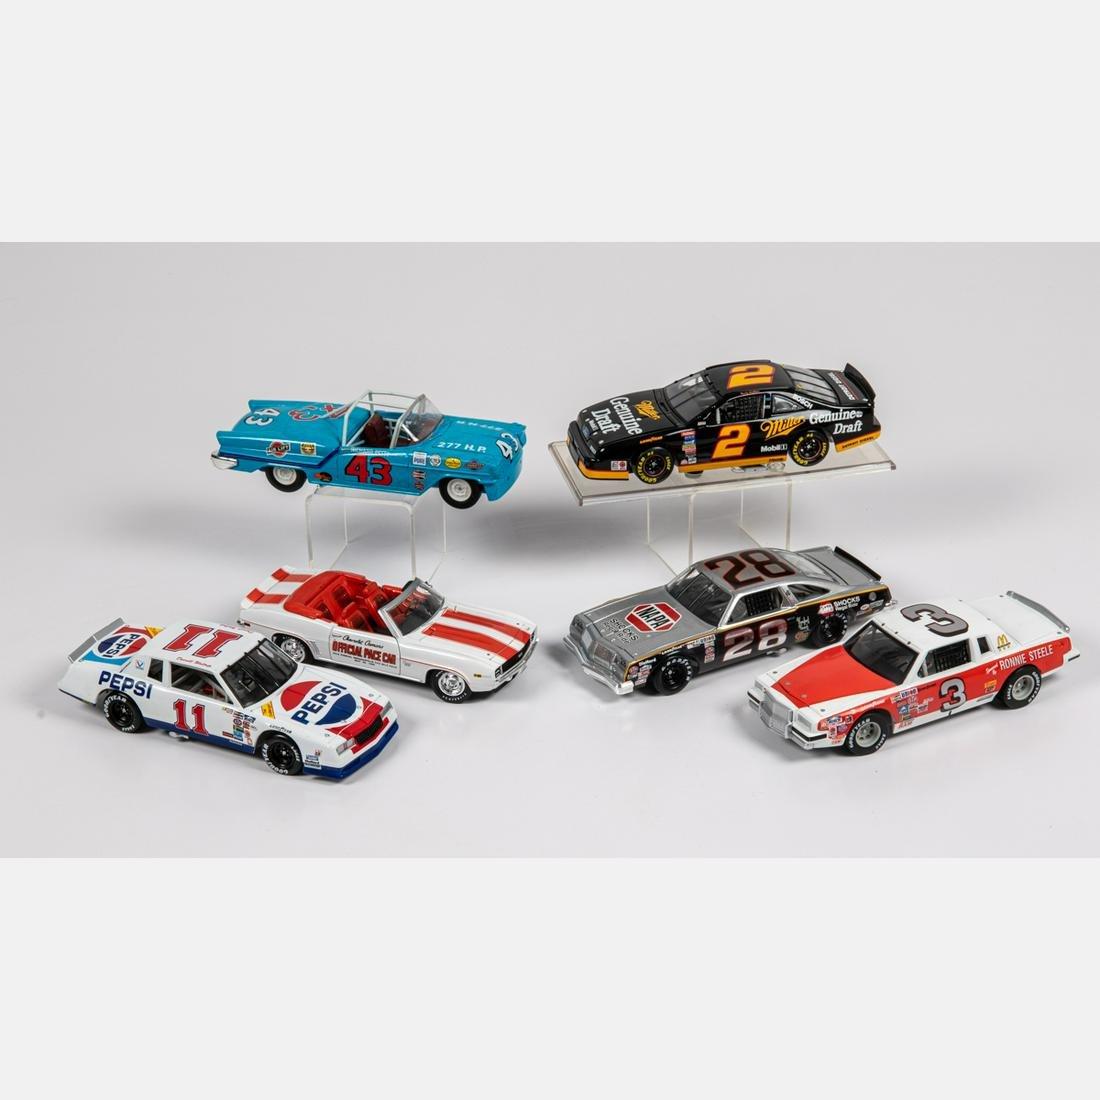 Group of 1:18 Scale Nascar Race Car Models